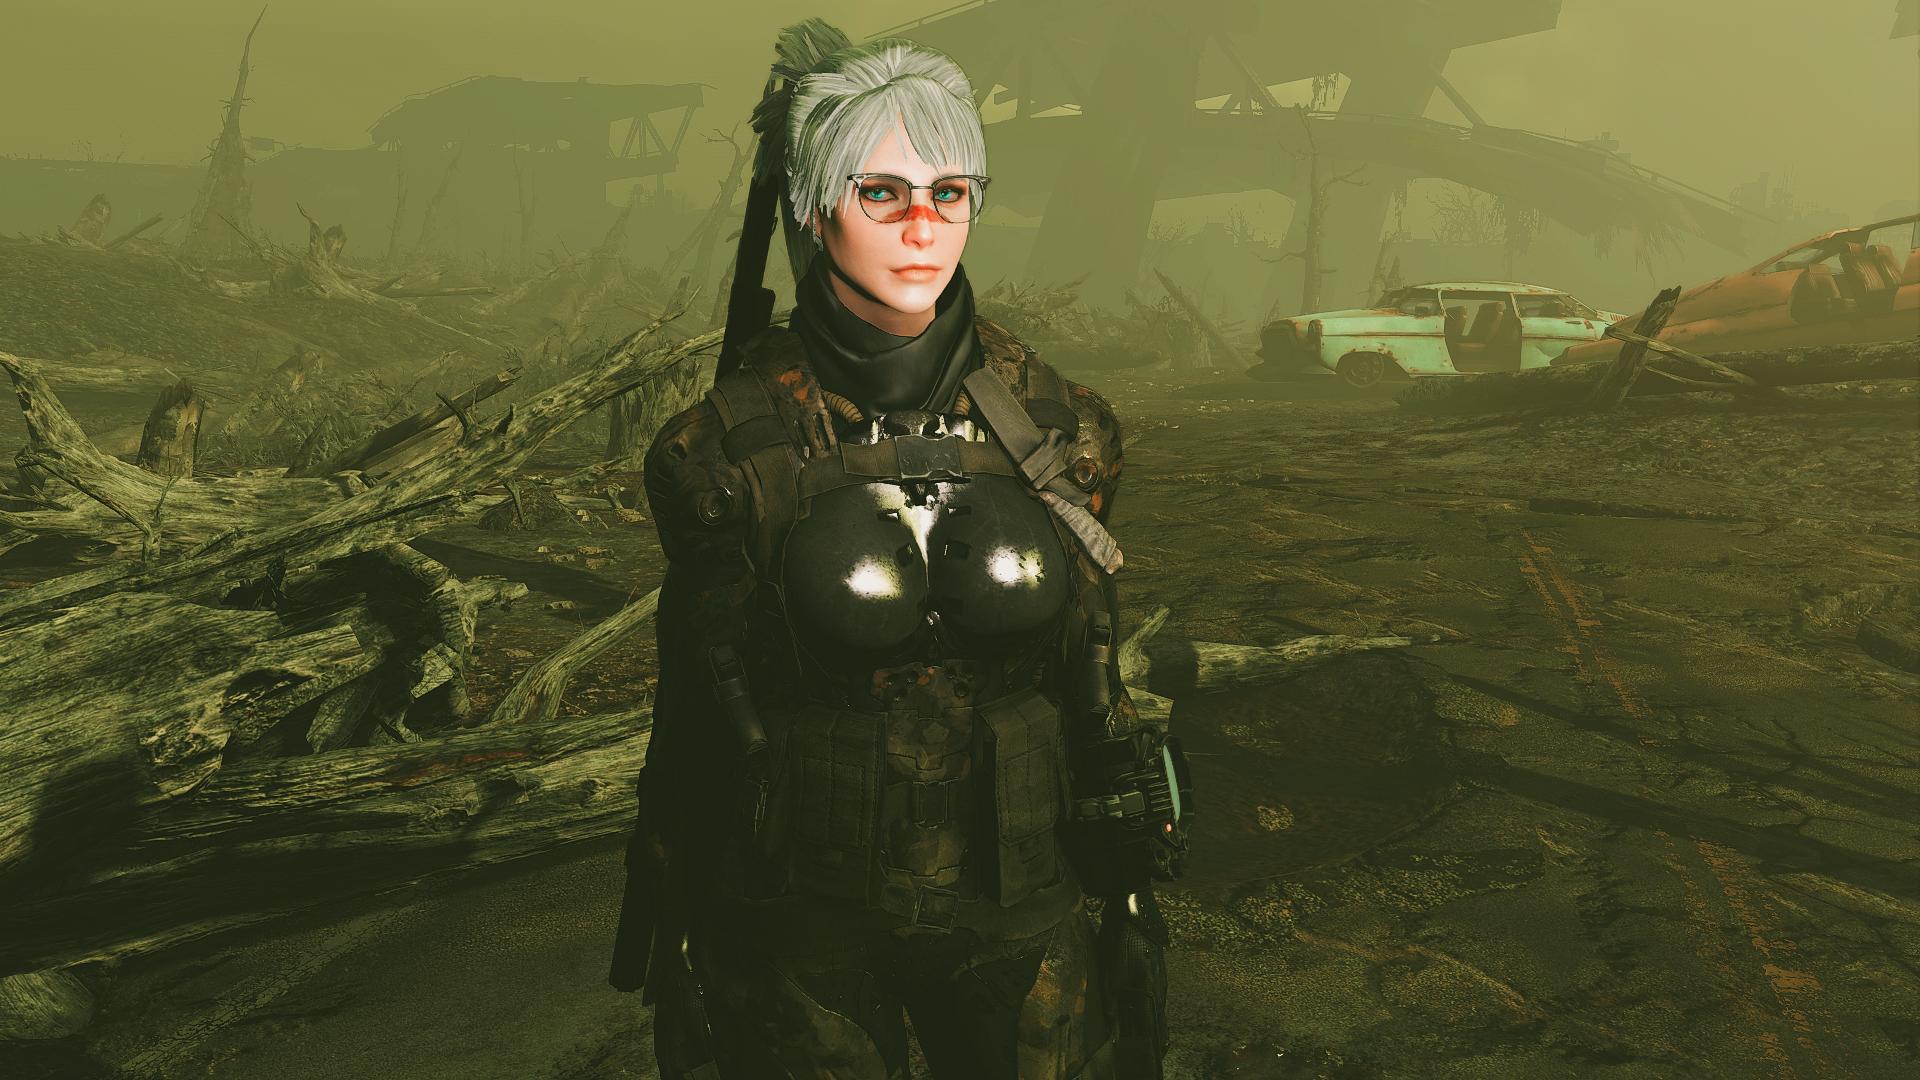 Fallout4 2019-10-25 05-19-02.png - Fallout 4